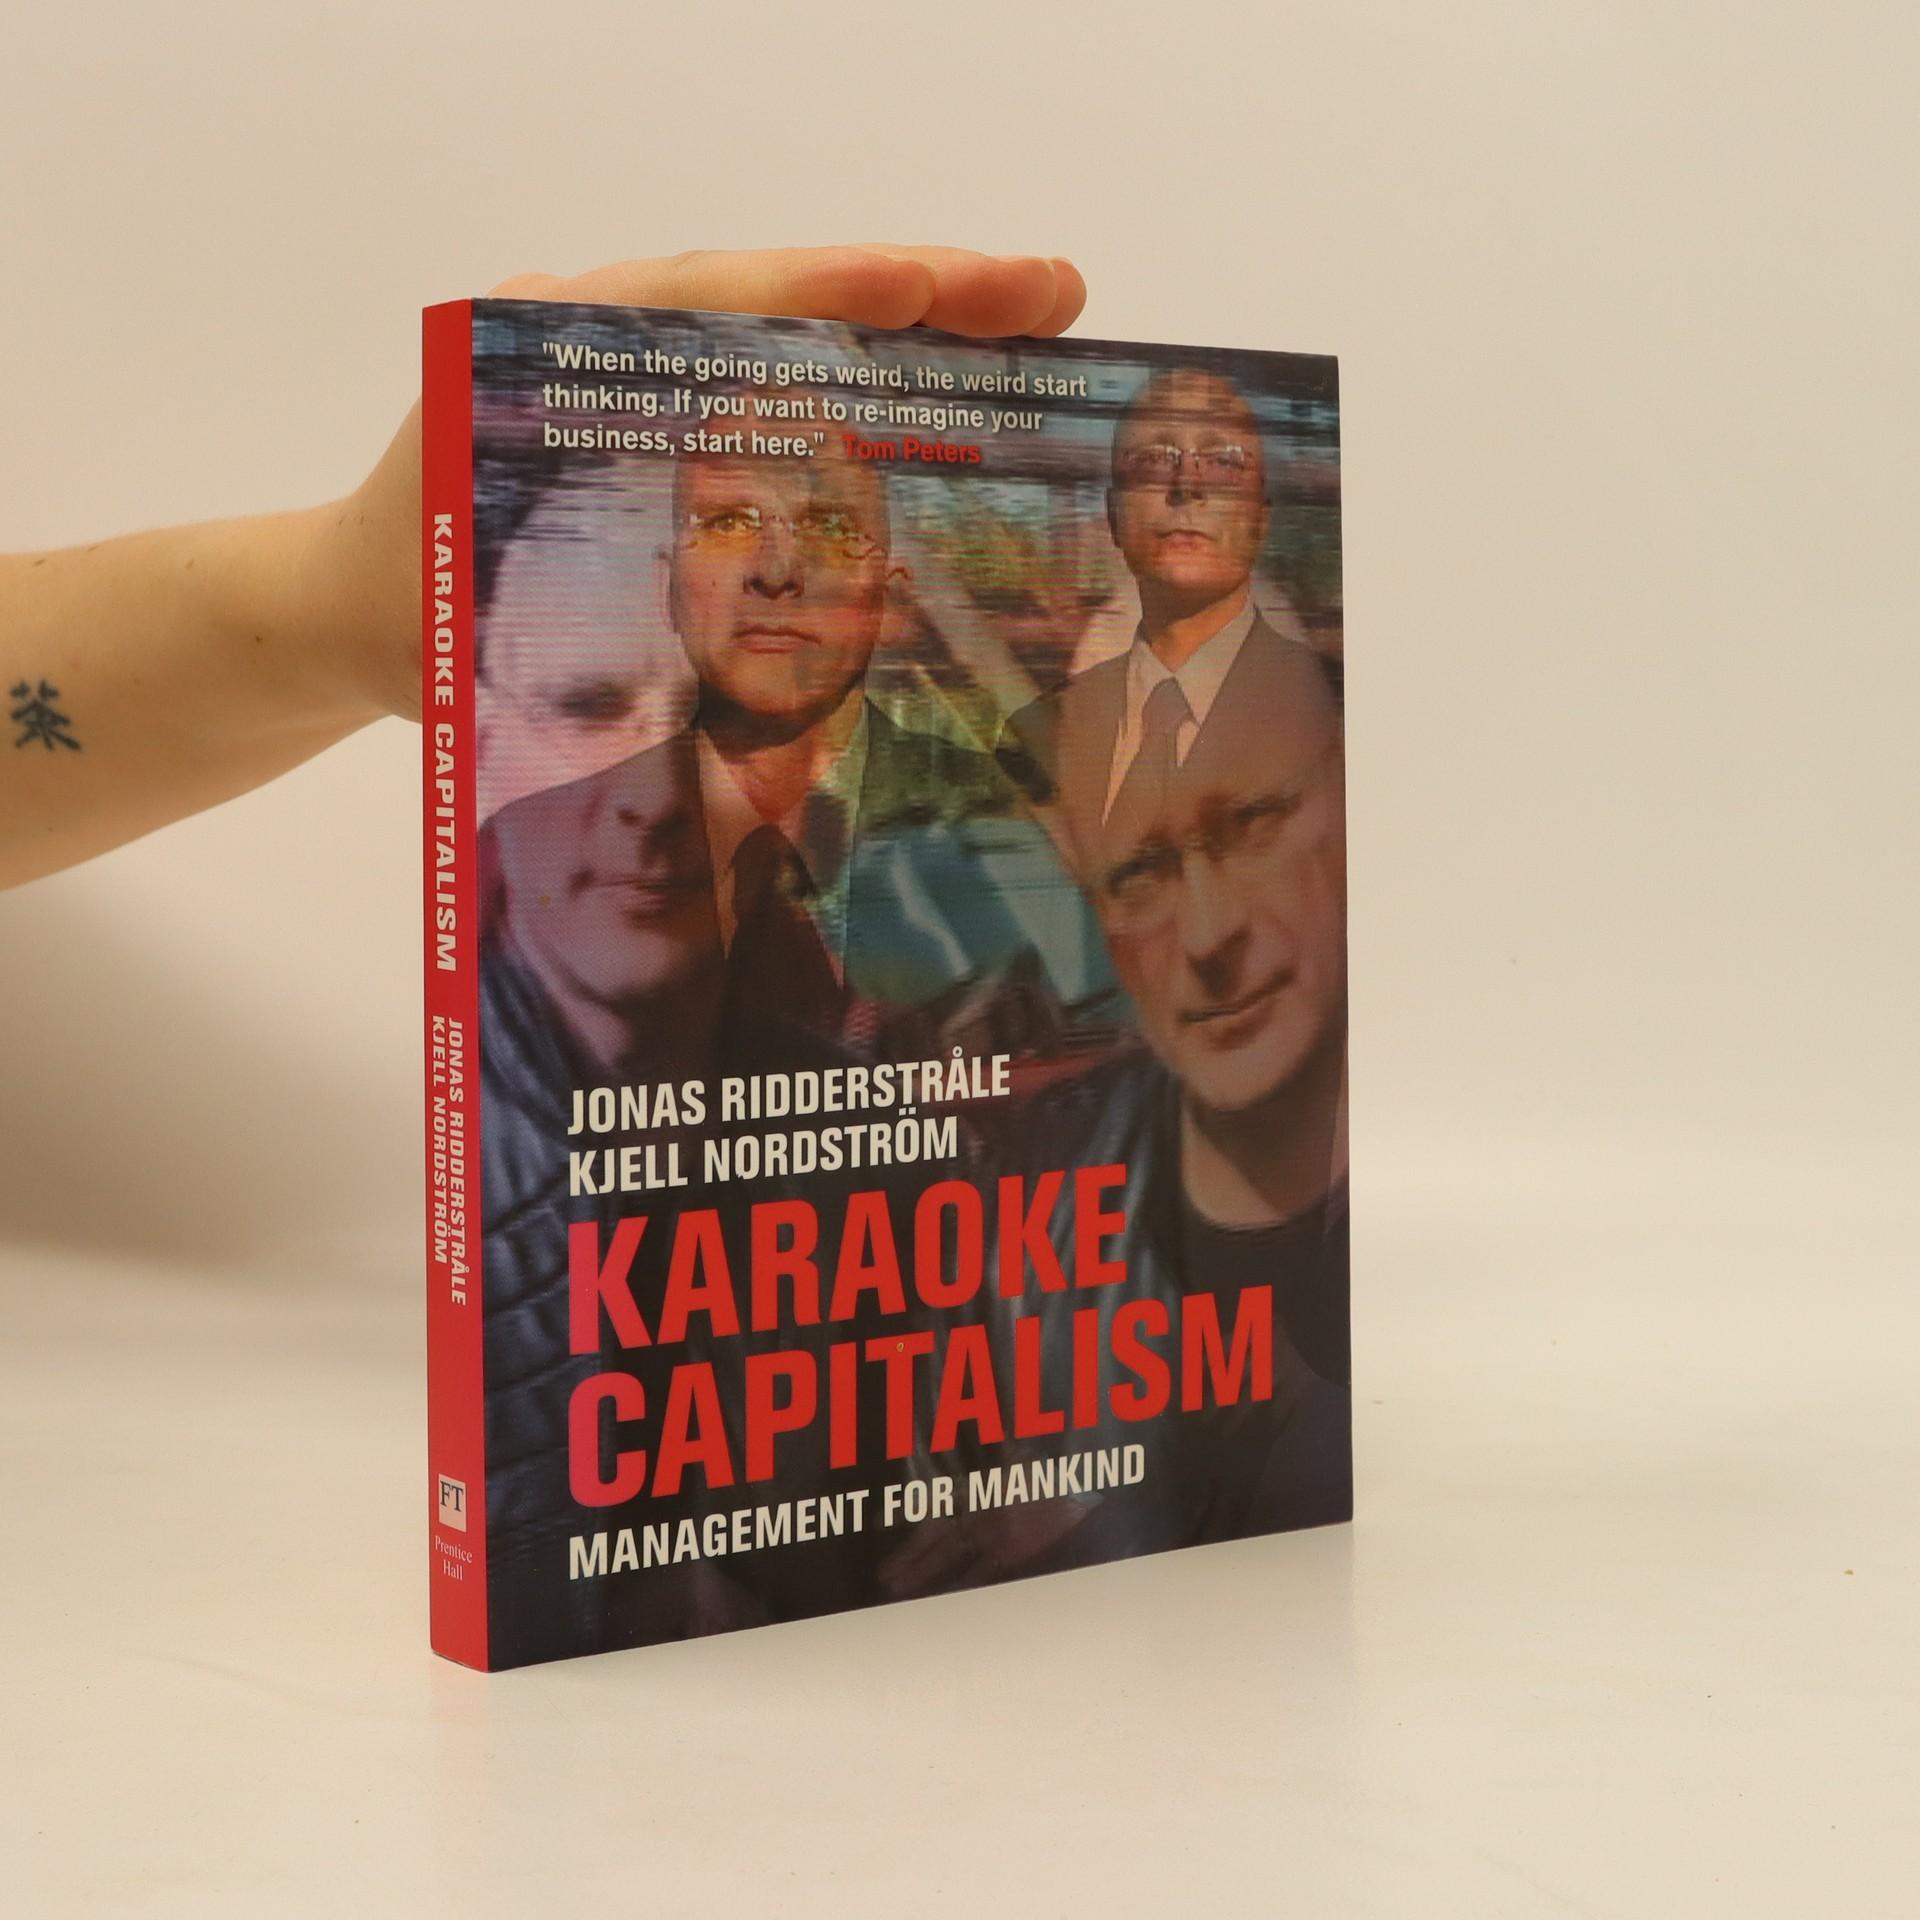 antikvární kniha Karaoke capitalism : managing for mankind, neuveden